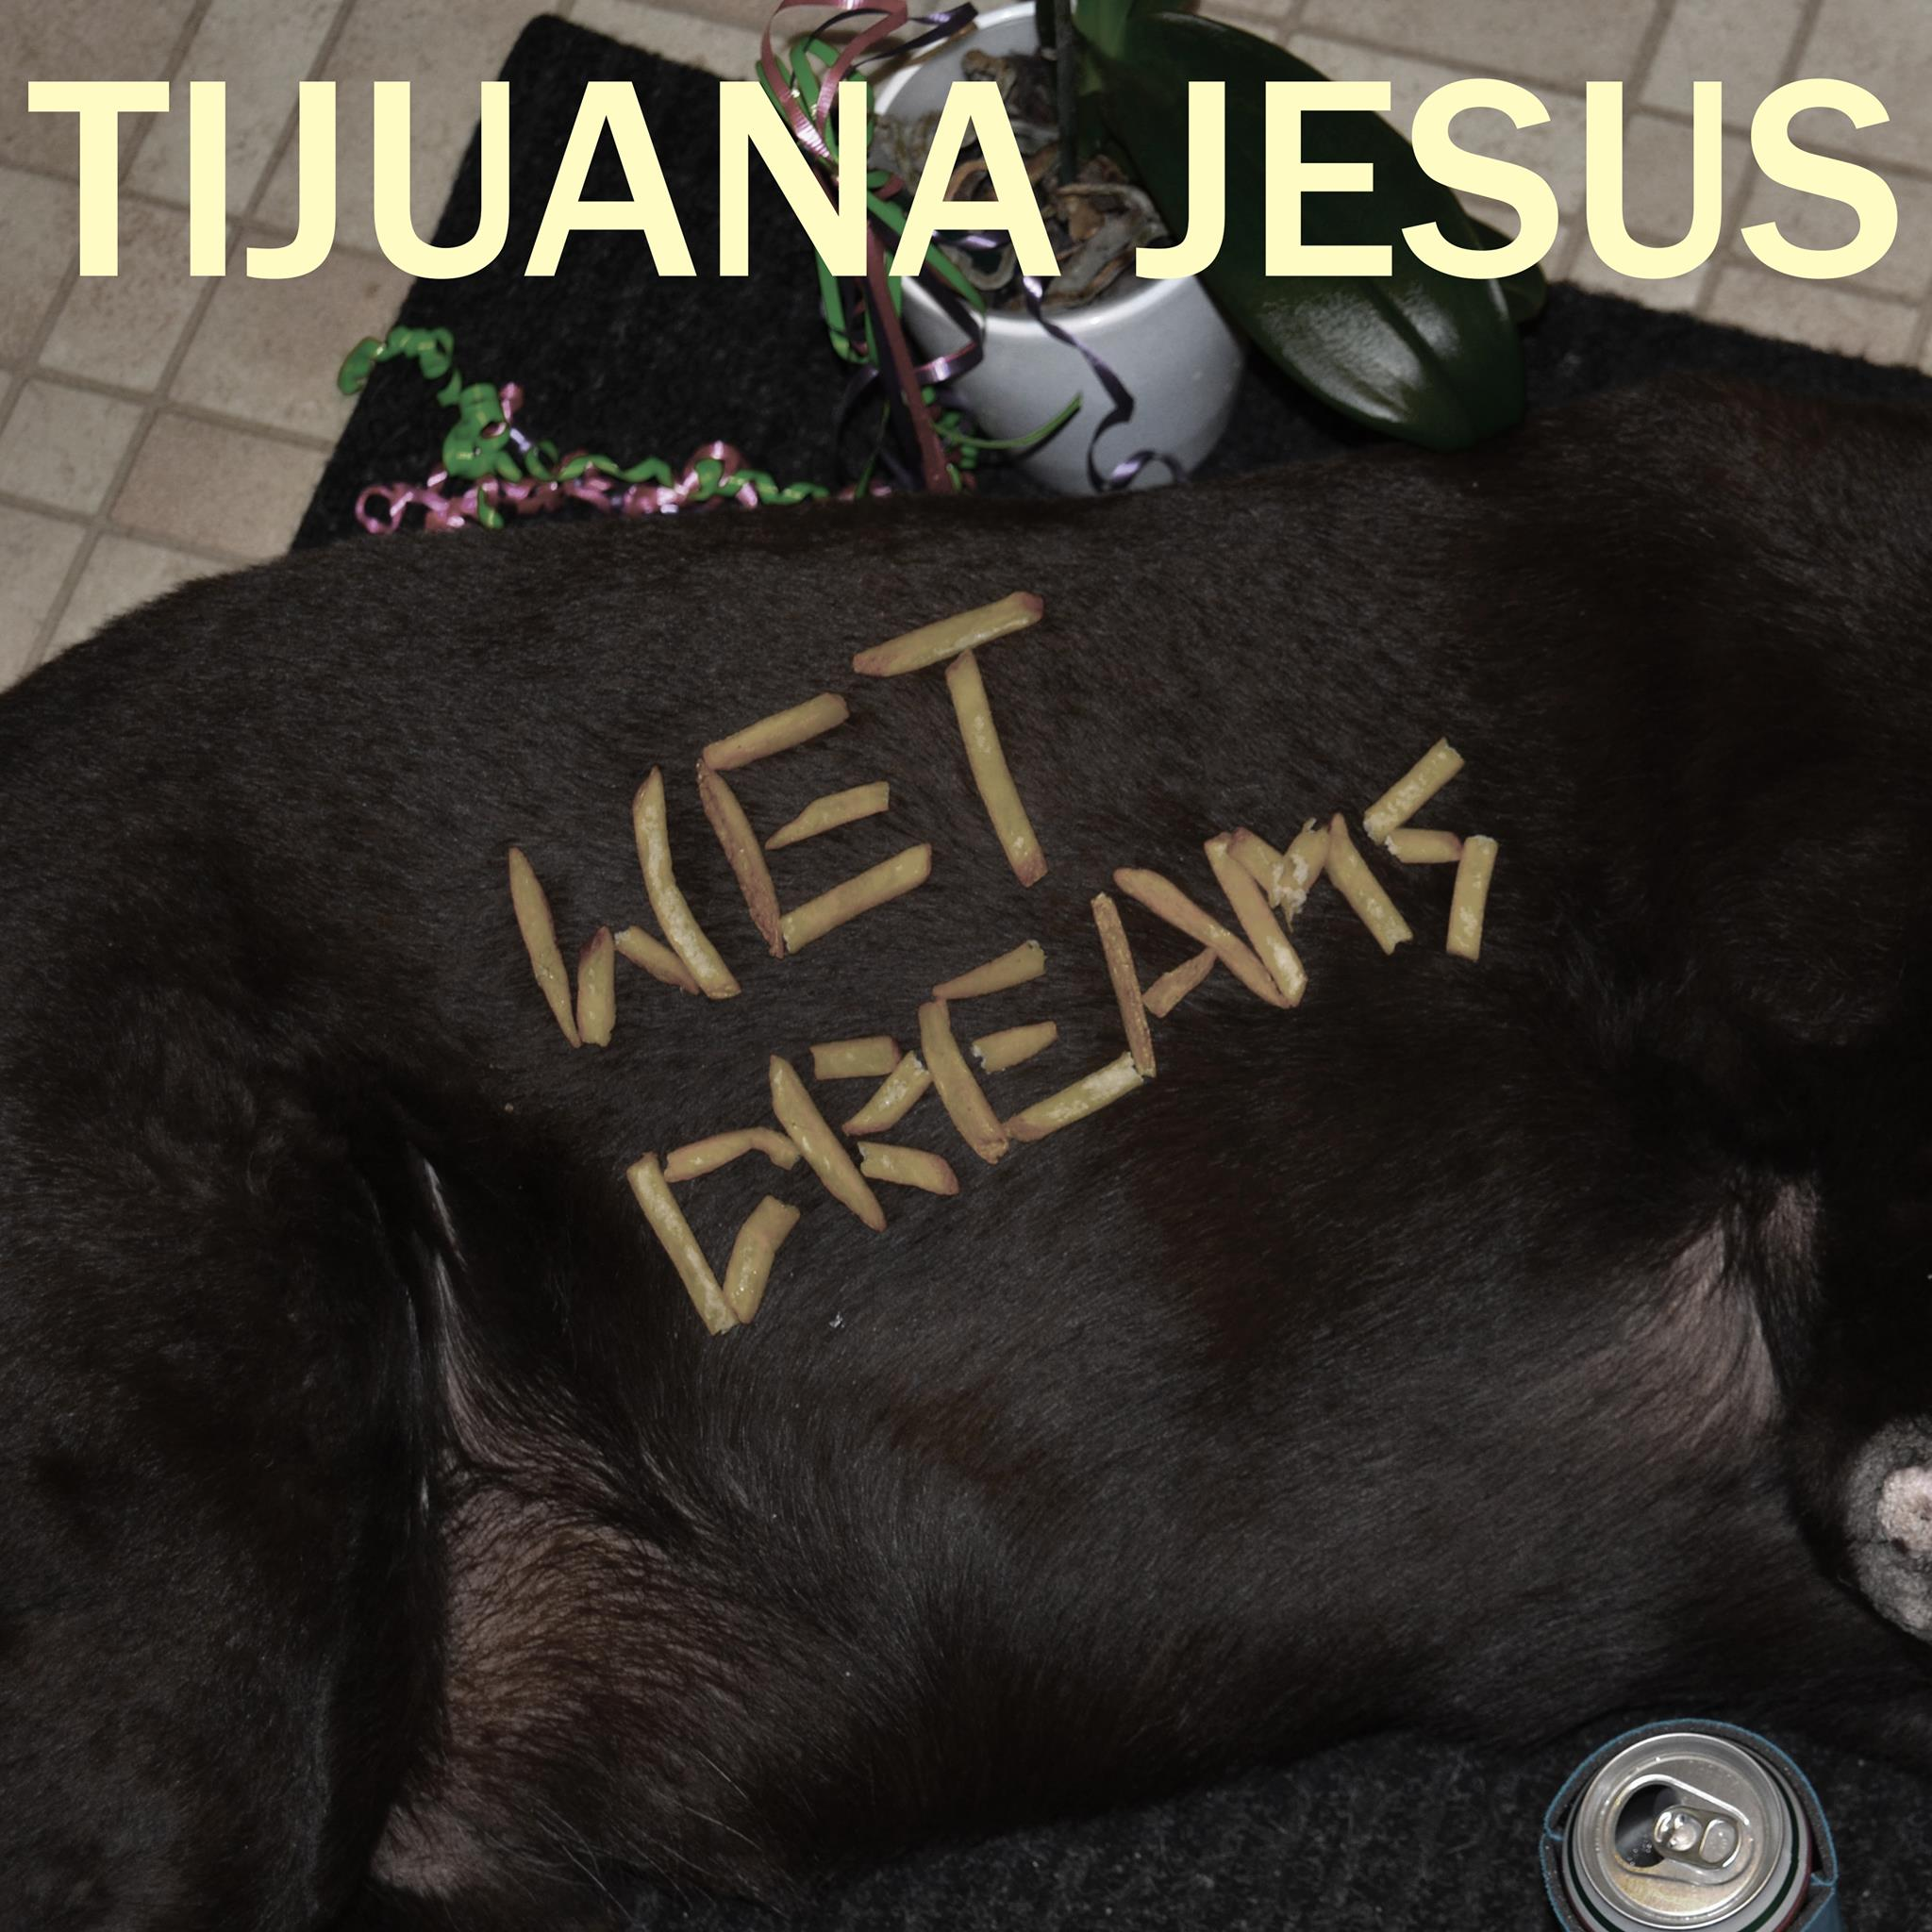 Tijuana Jesus & Lush Buffalo Ep release